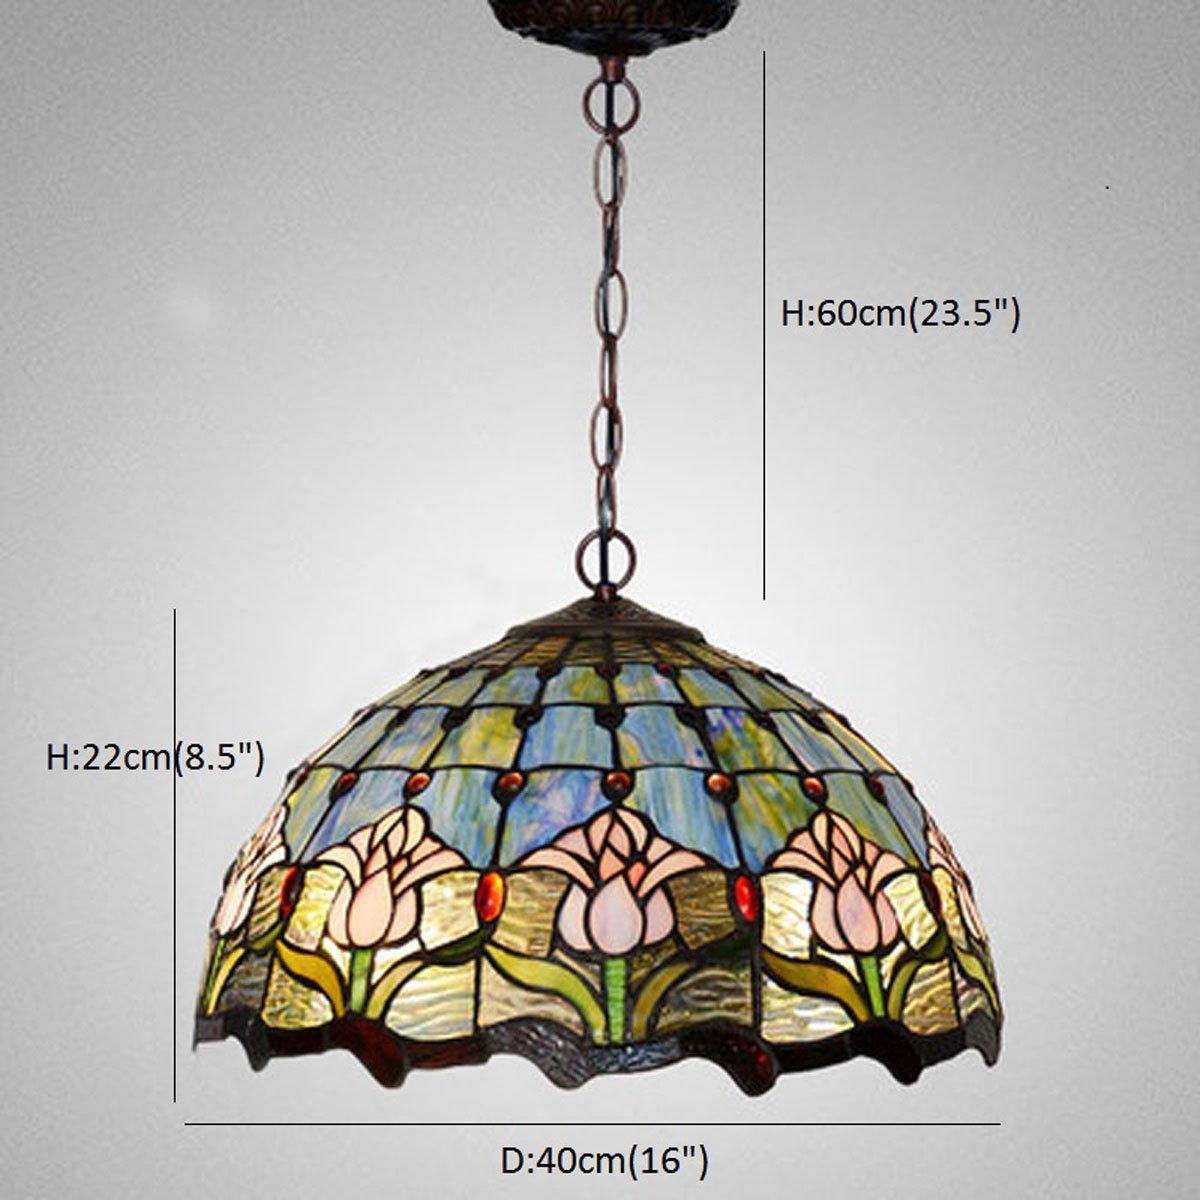 Fumat tiffany pendant lights ceiling lighting fixtures led e26 16